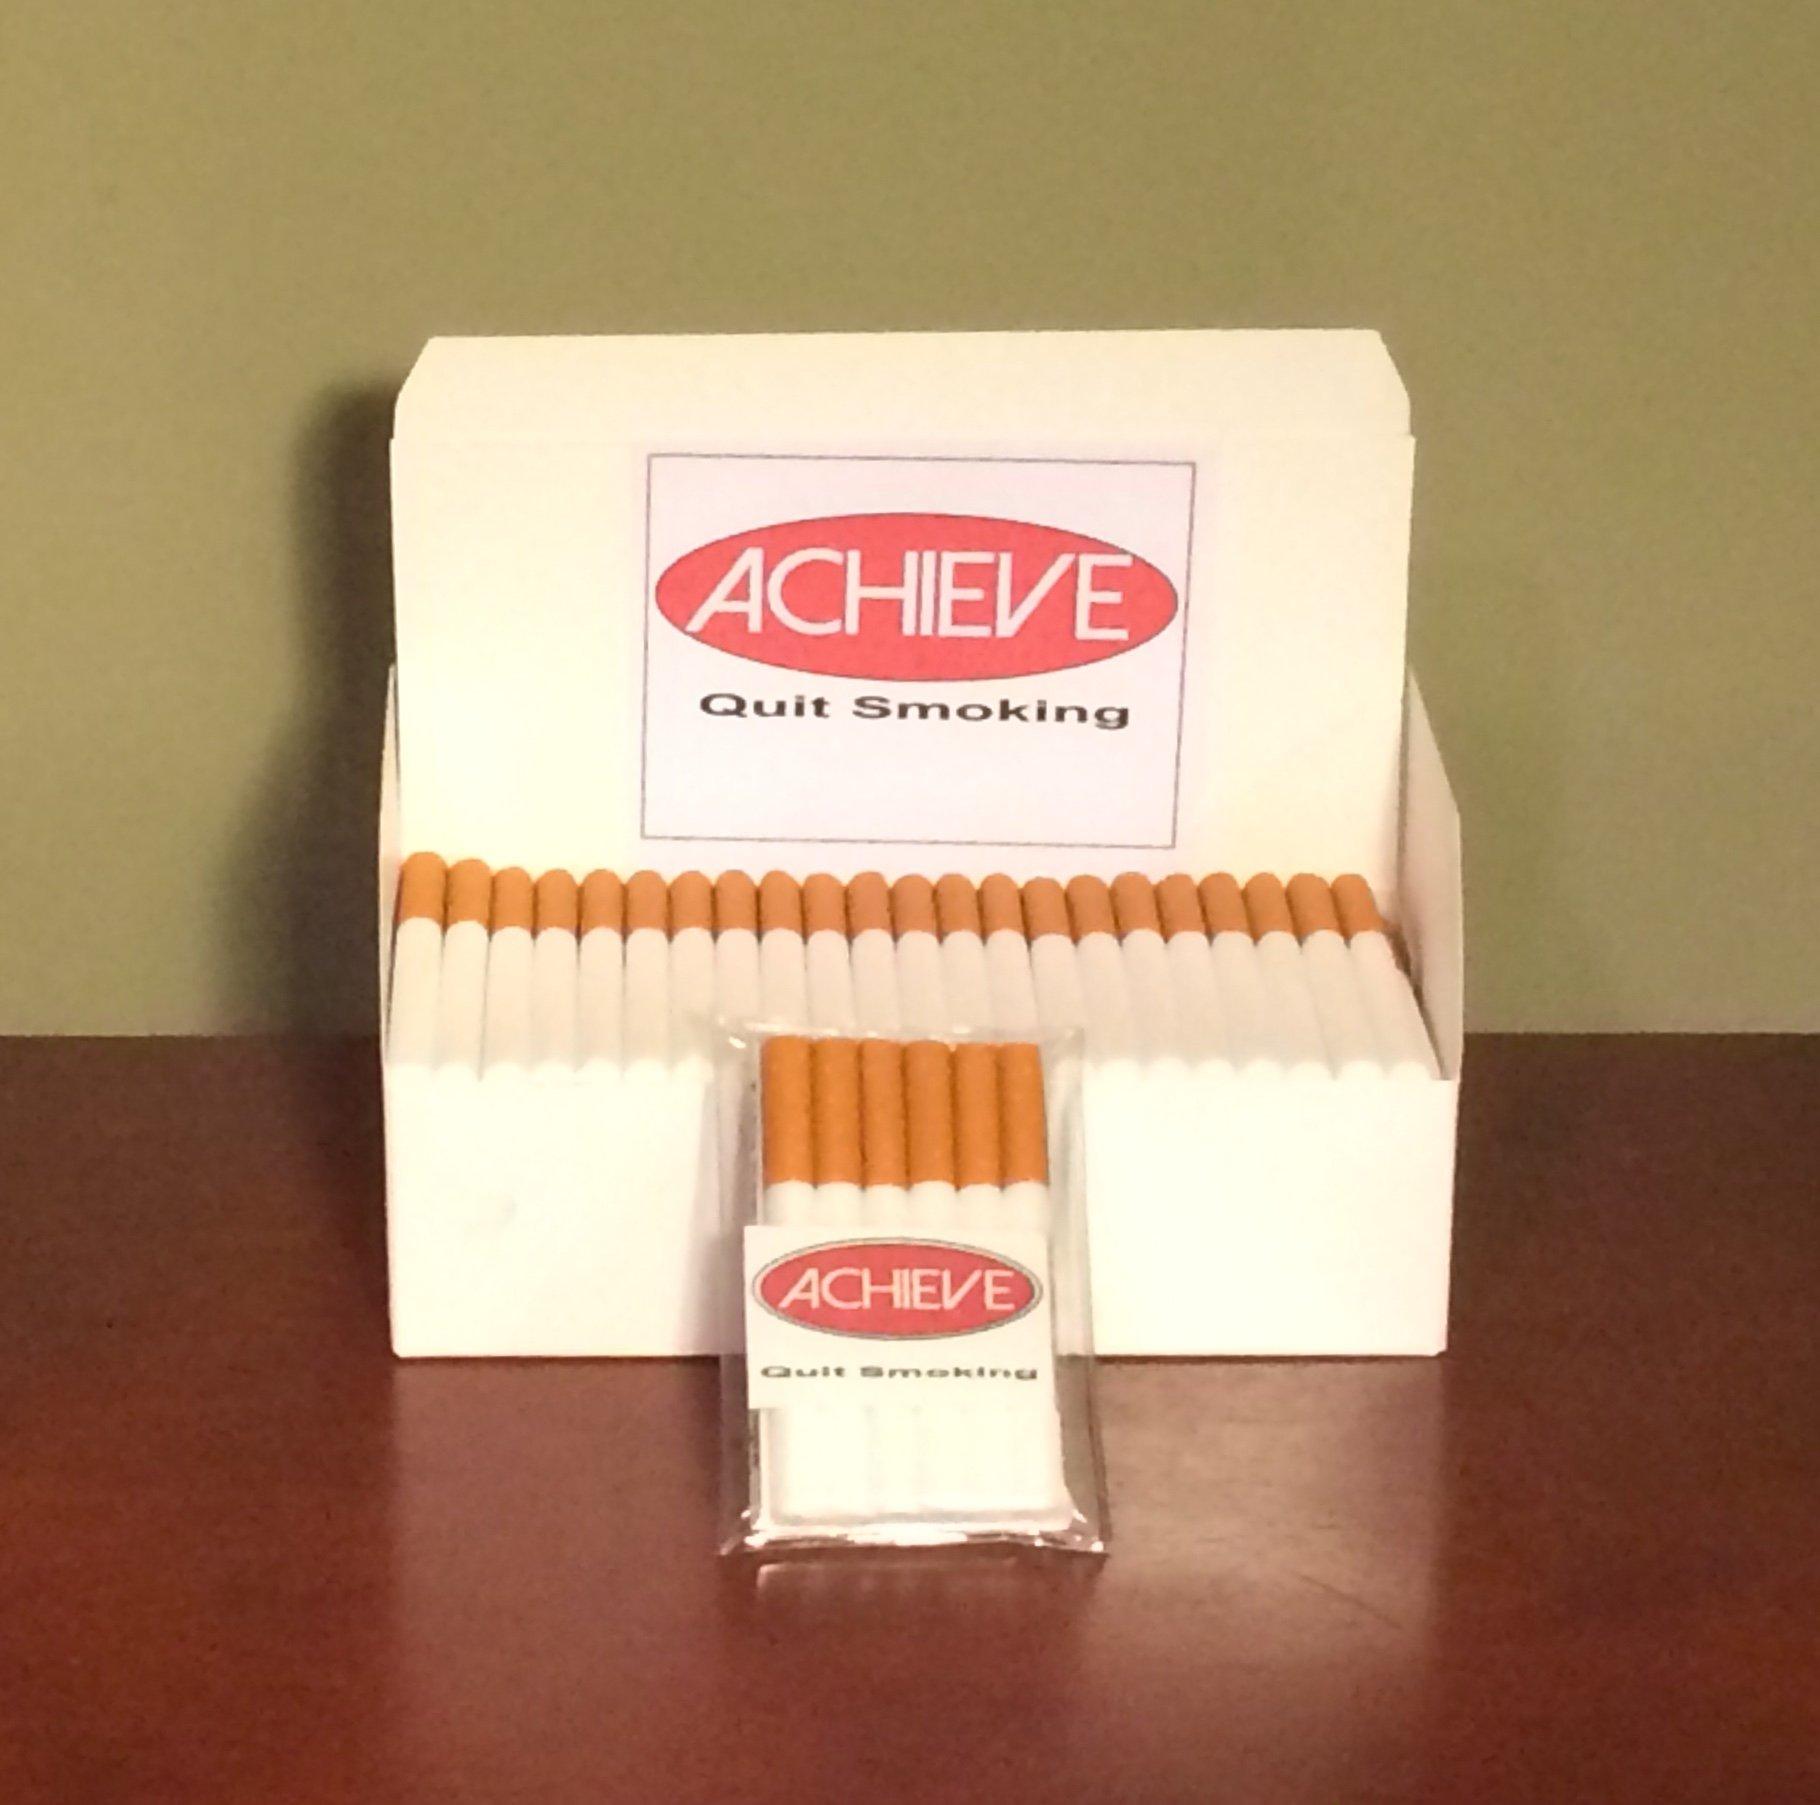 Achieve Quit Smoking Fake Cigarettes | Smoking Cessation Cigarette Substitute